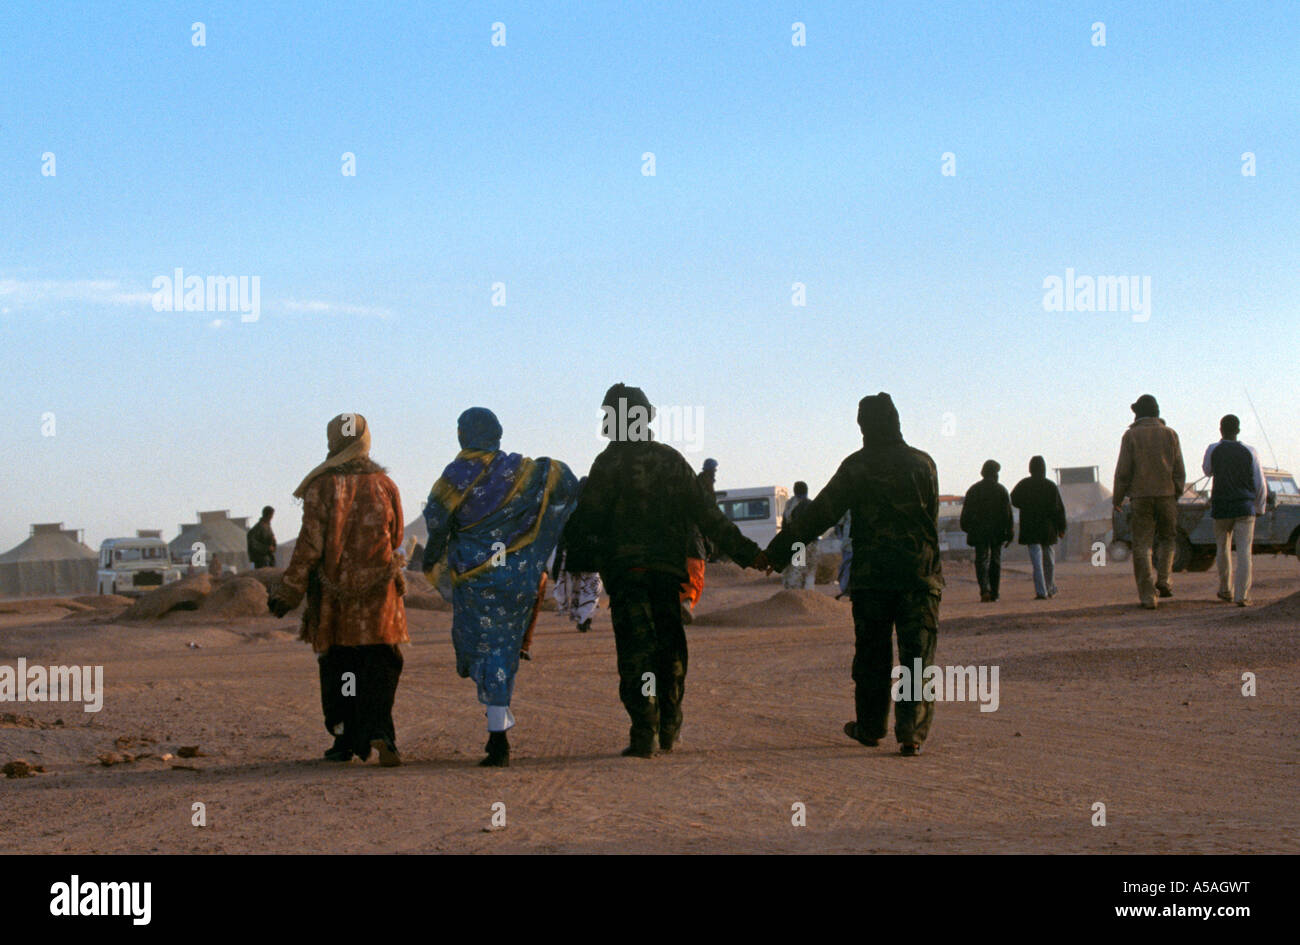 A Sahrawi refugee camp in Tindouf Western Algeria - Stock Image